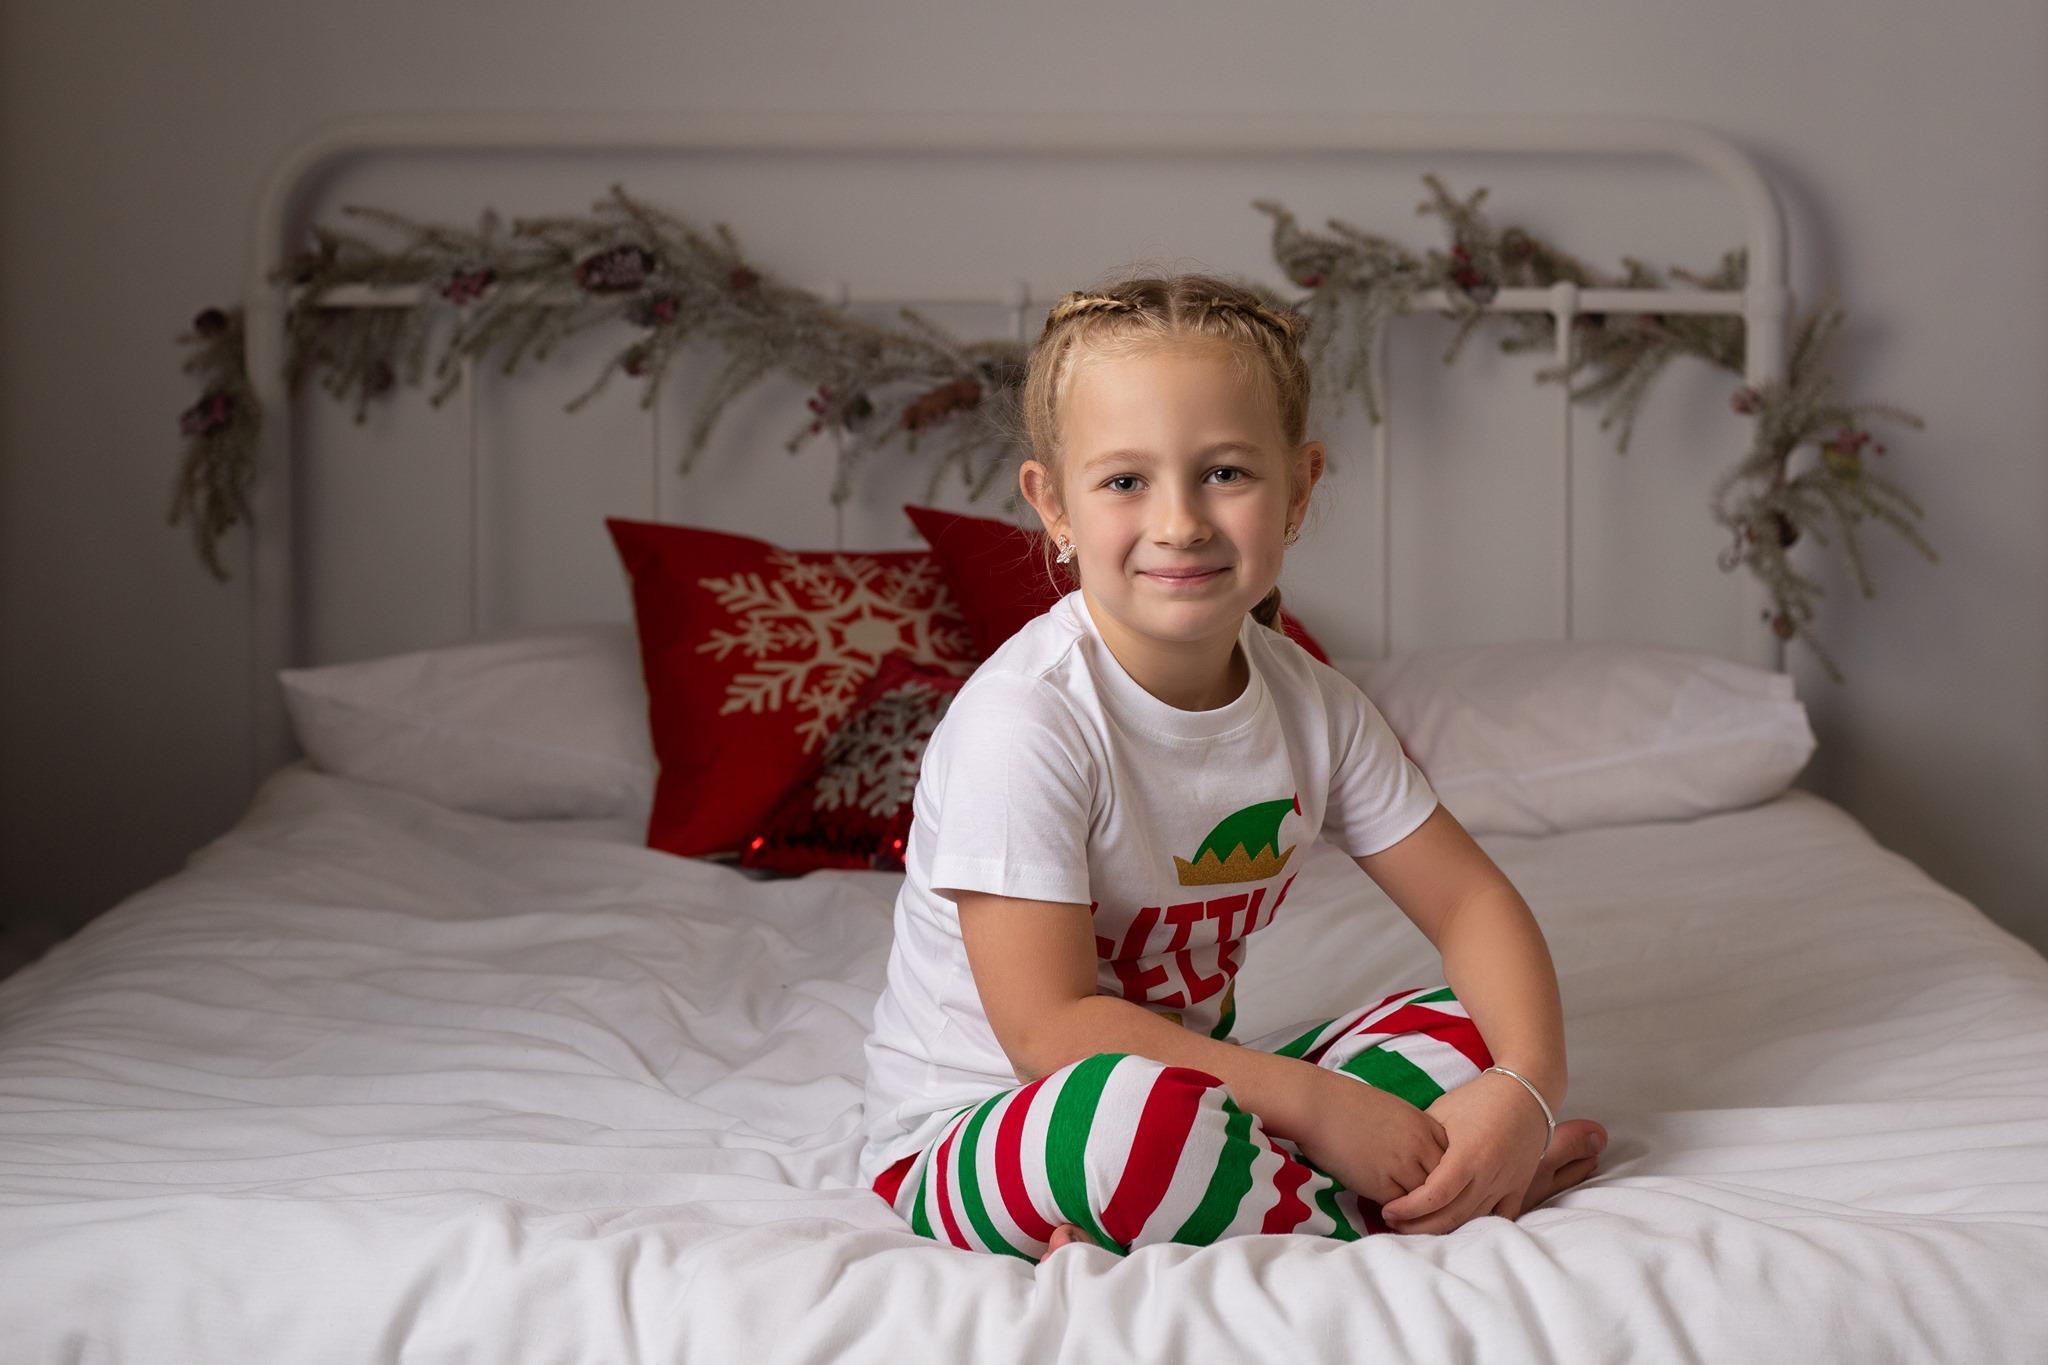 CHRISTMAS-MINI-XMAS-SESSION-CHRISTMAS-PHOTOSHOOT-CHRISTMAS-BED-WHITE-SET-WILLENHALL-WOLVERHAMPTON-WEST-MIDLANDS-1.jpg